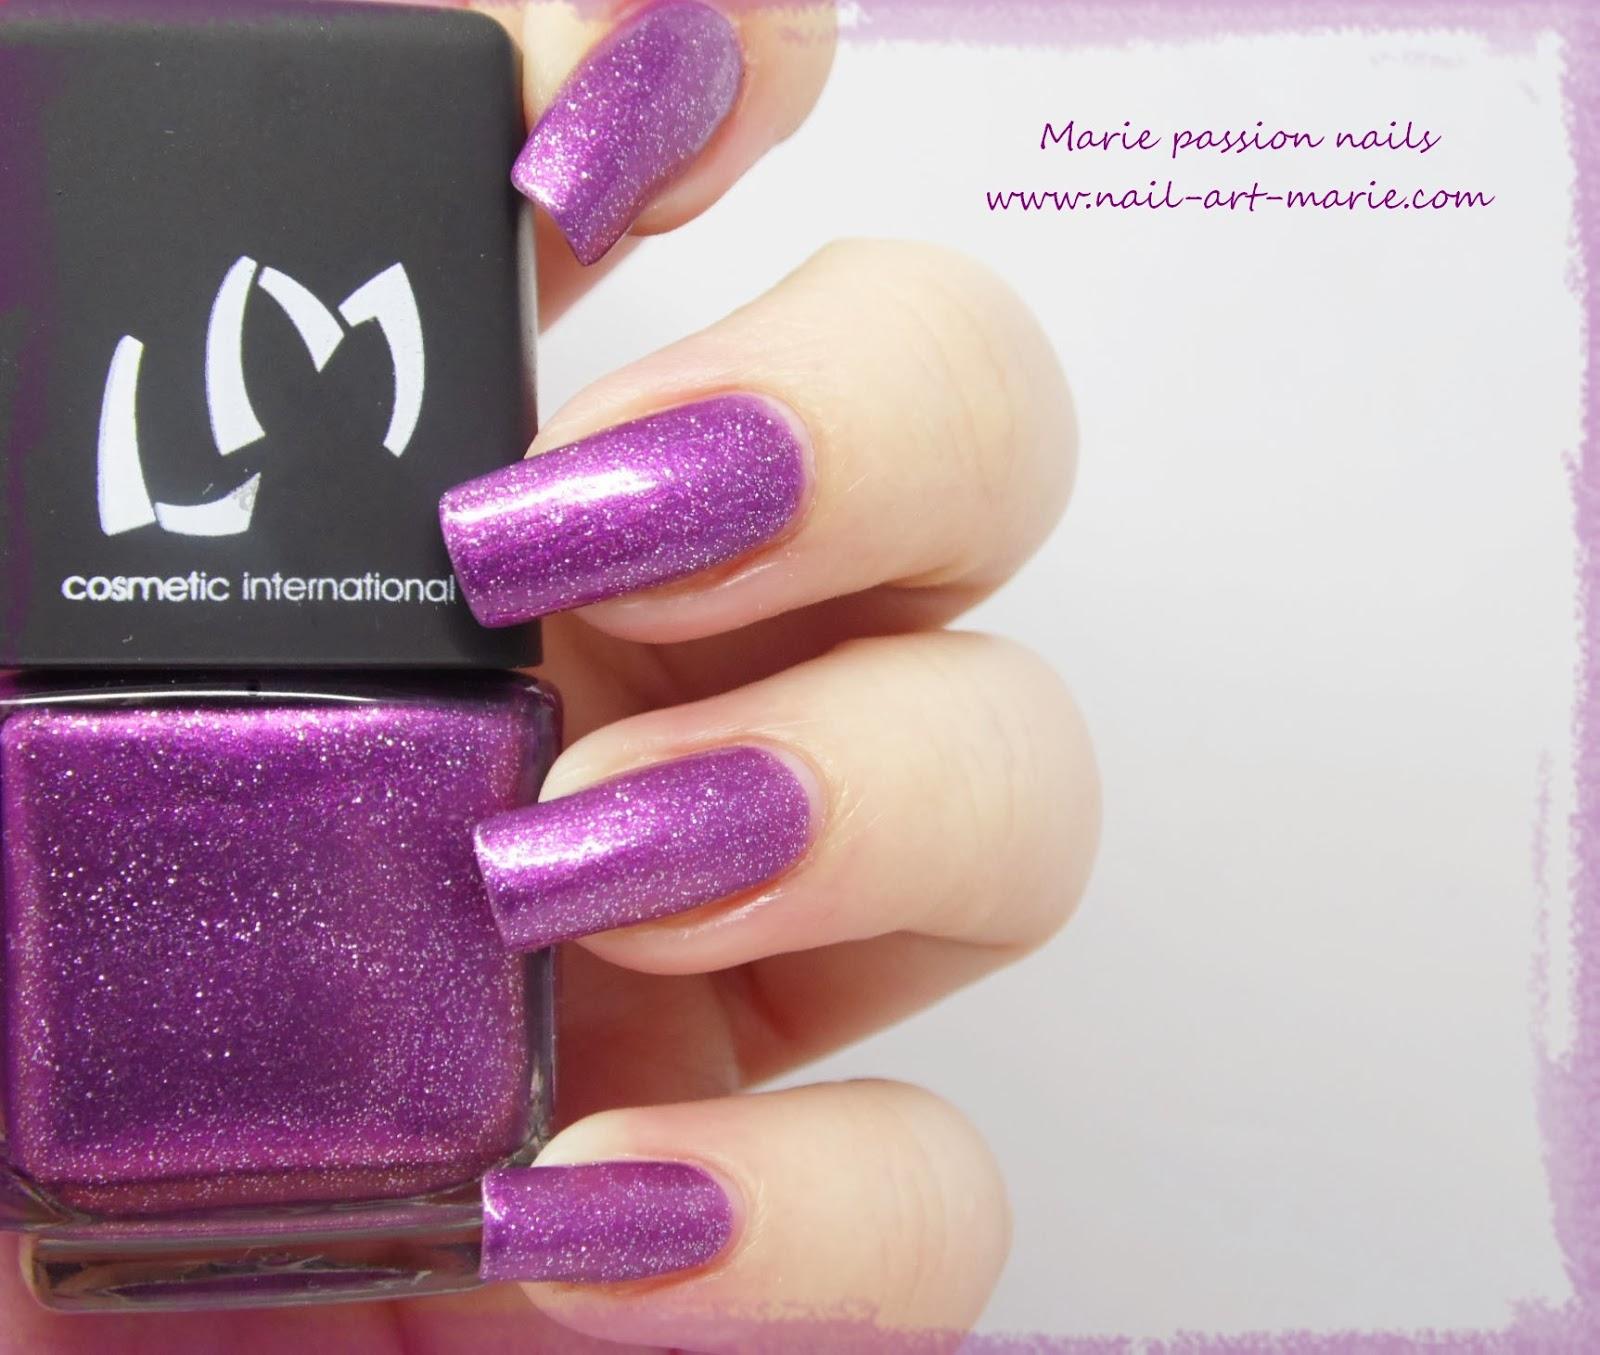 LM Cosmetic Moretta3